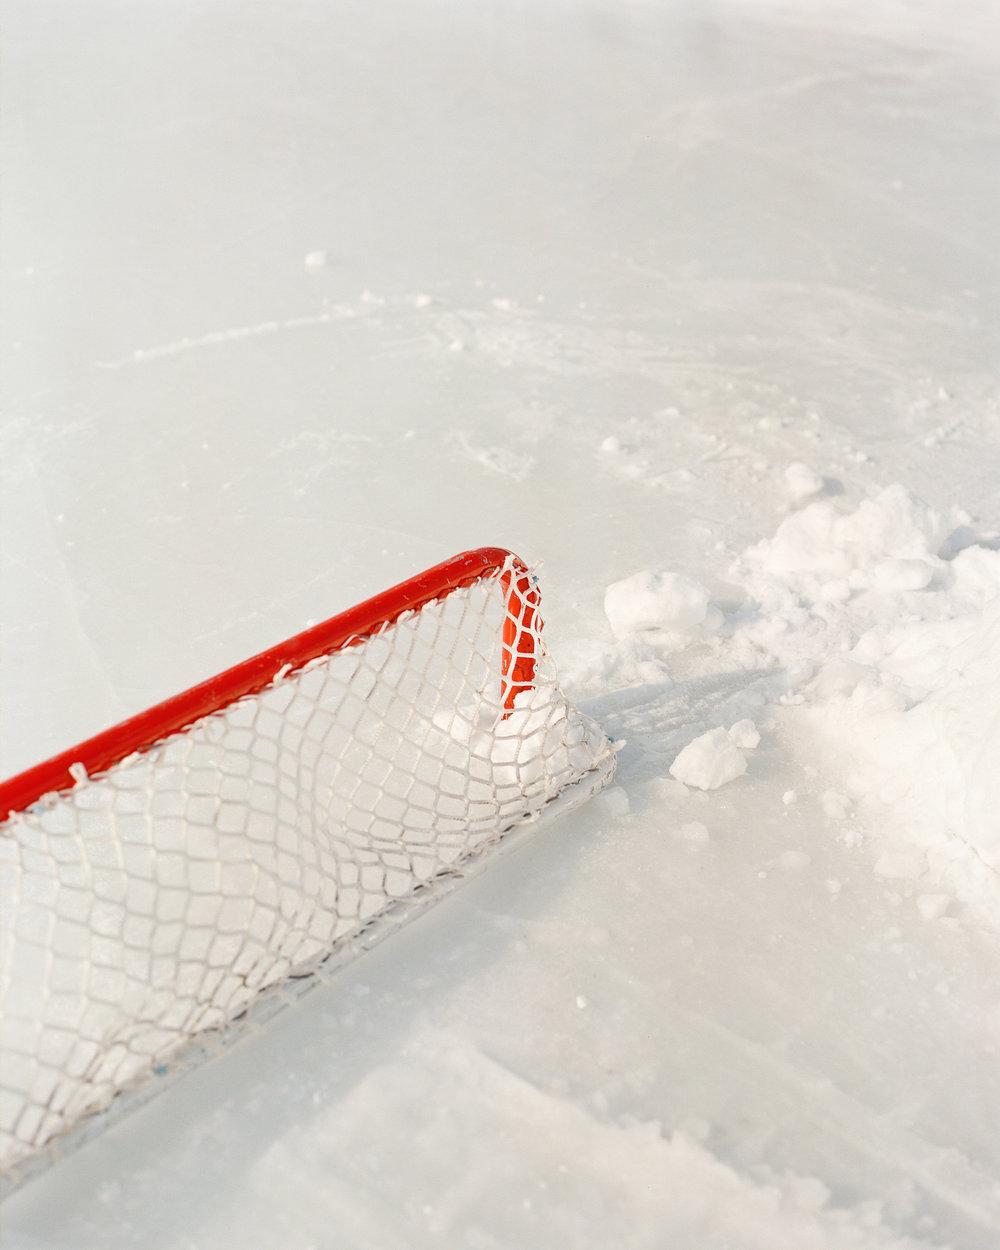 205.EnRoute-PondHockeyFilm_673.jpg